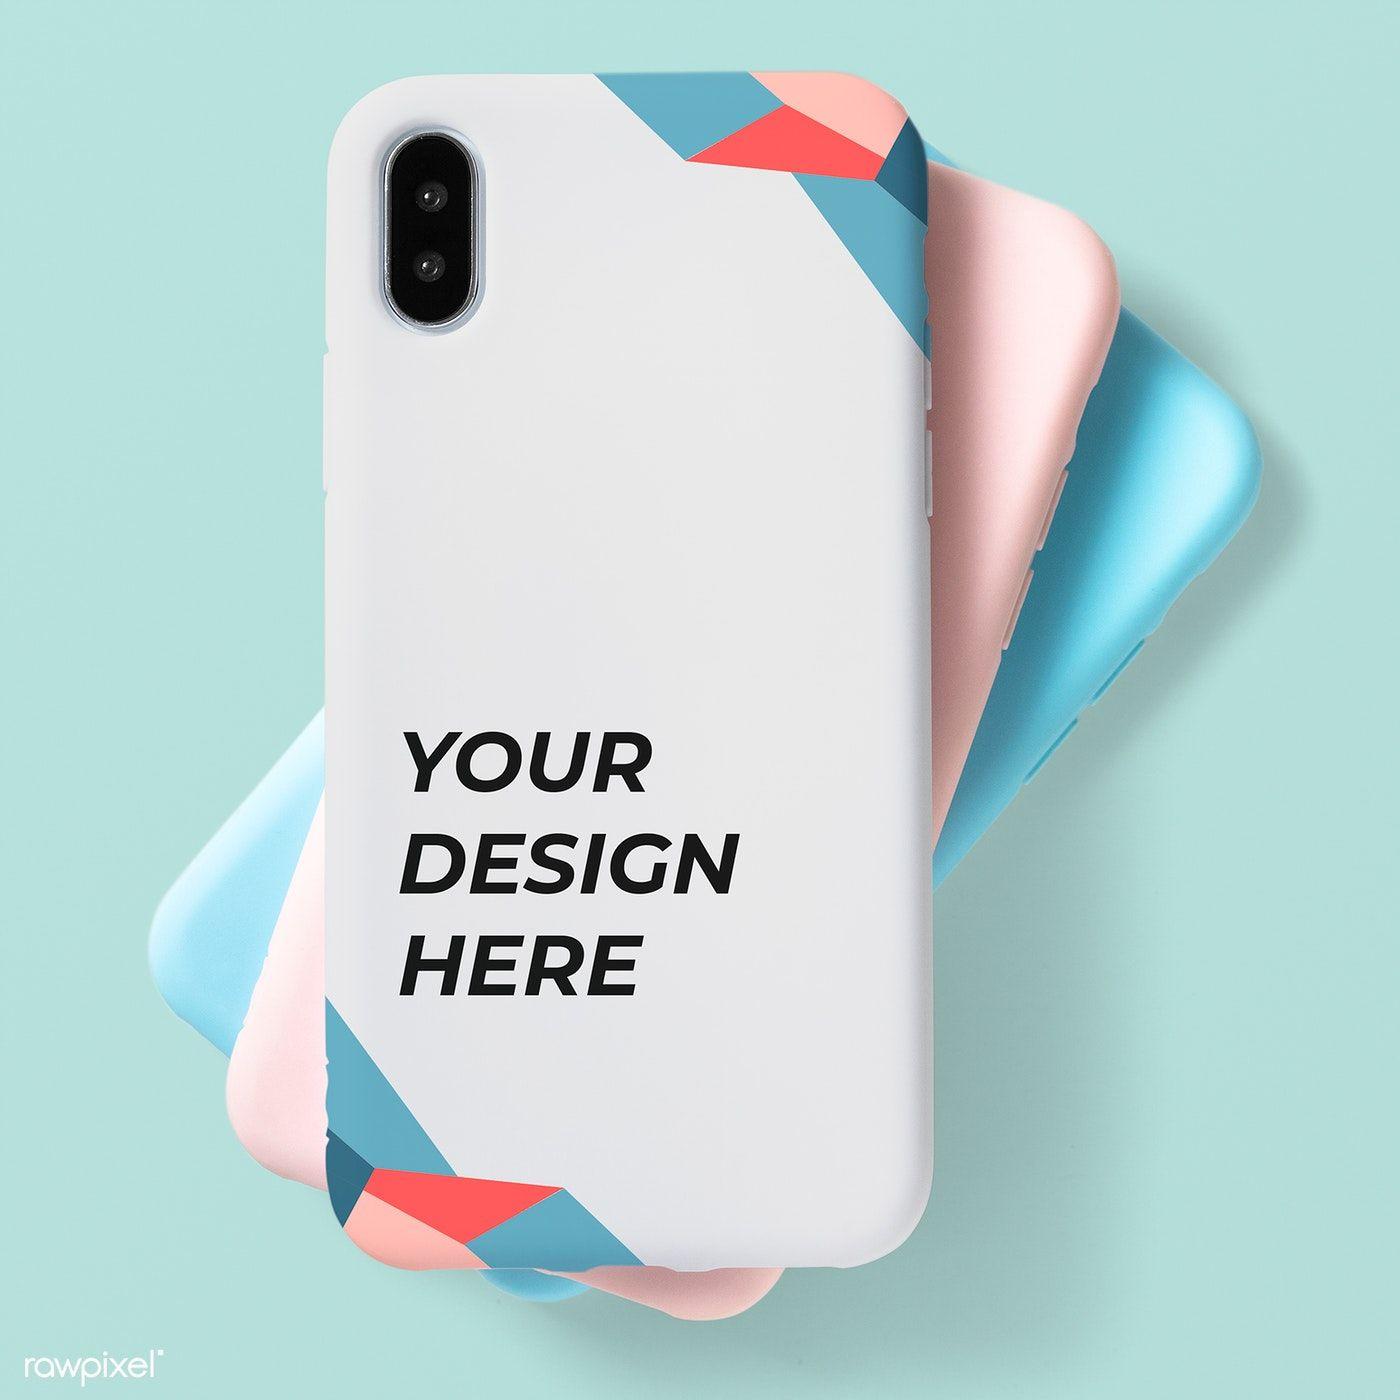 Download Premium Psd Of Pastel Mobile Phone Case Mockup 598479 Phone Cases Mobile Phone Case